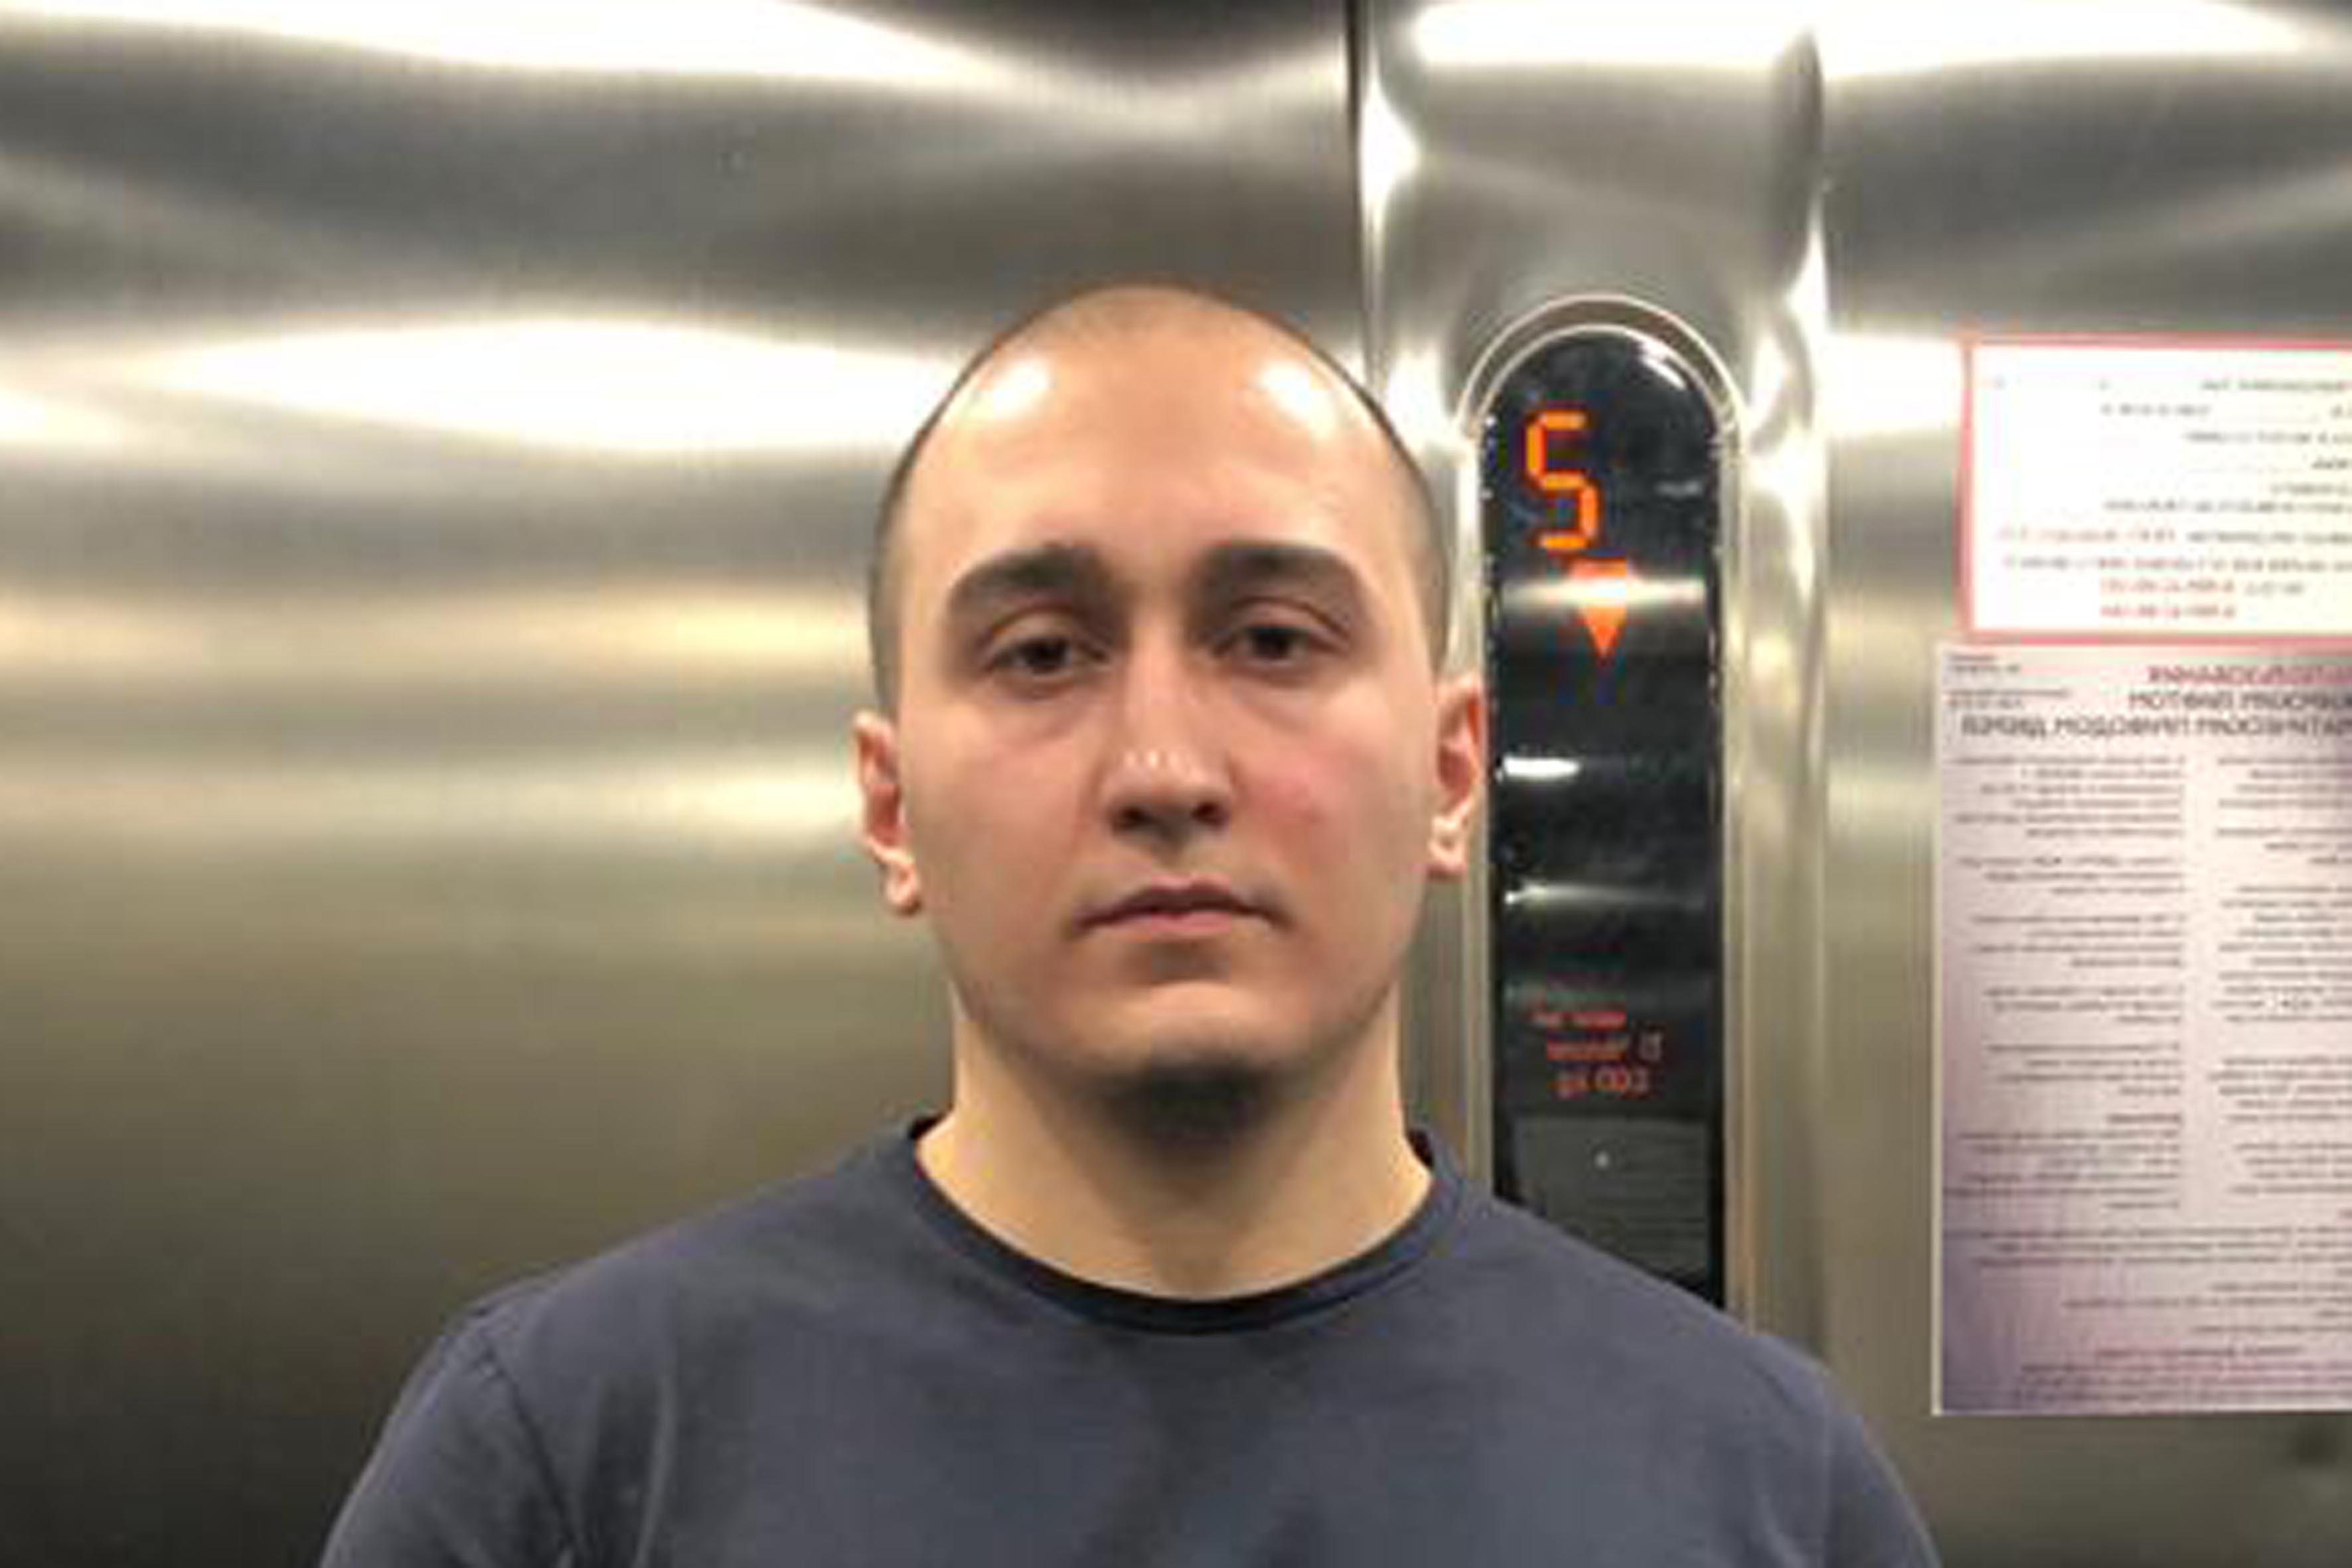 Габриелян Оник Андраникович. Акушер - гинеколог